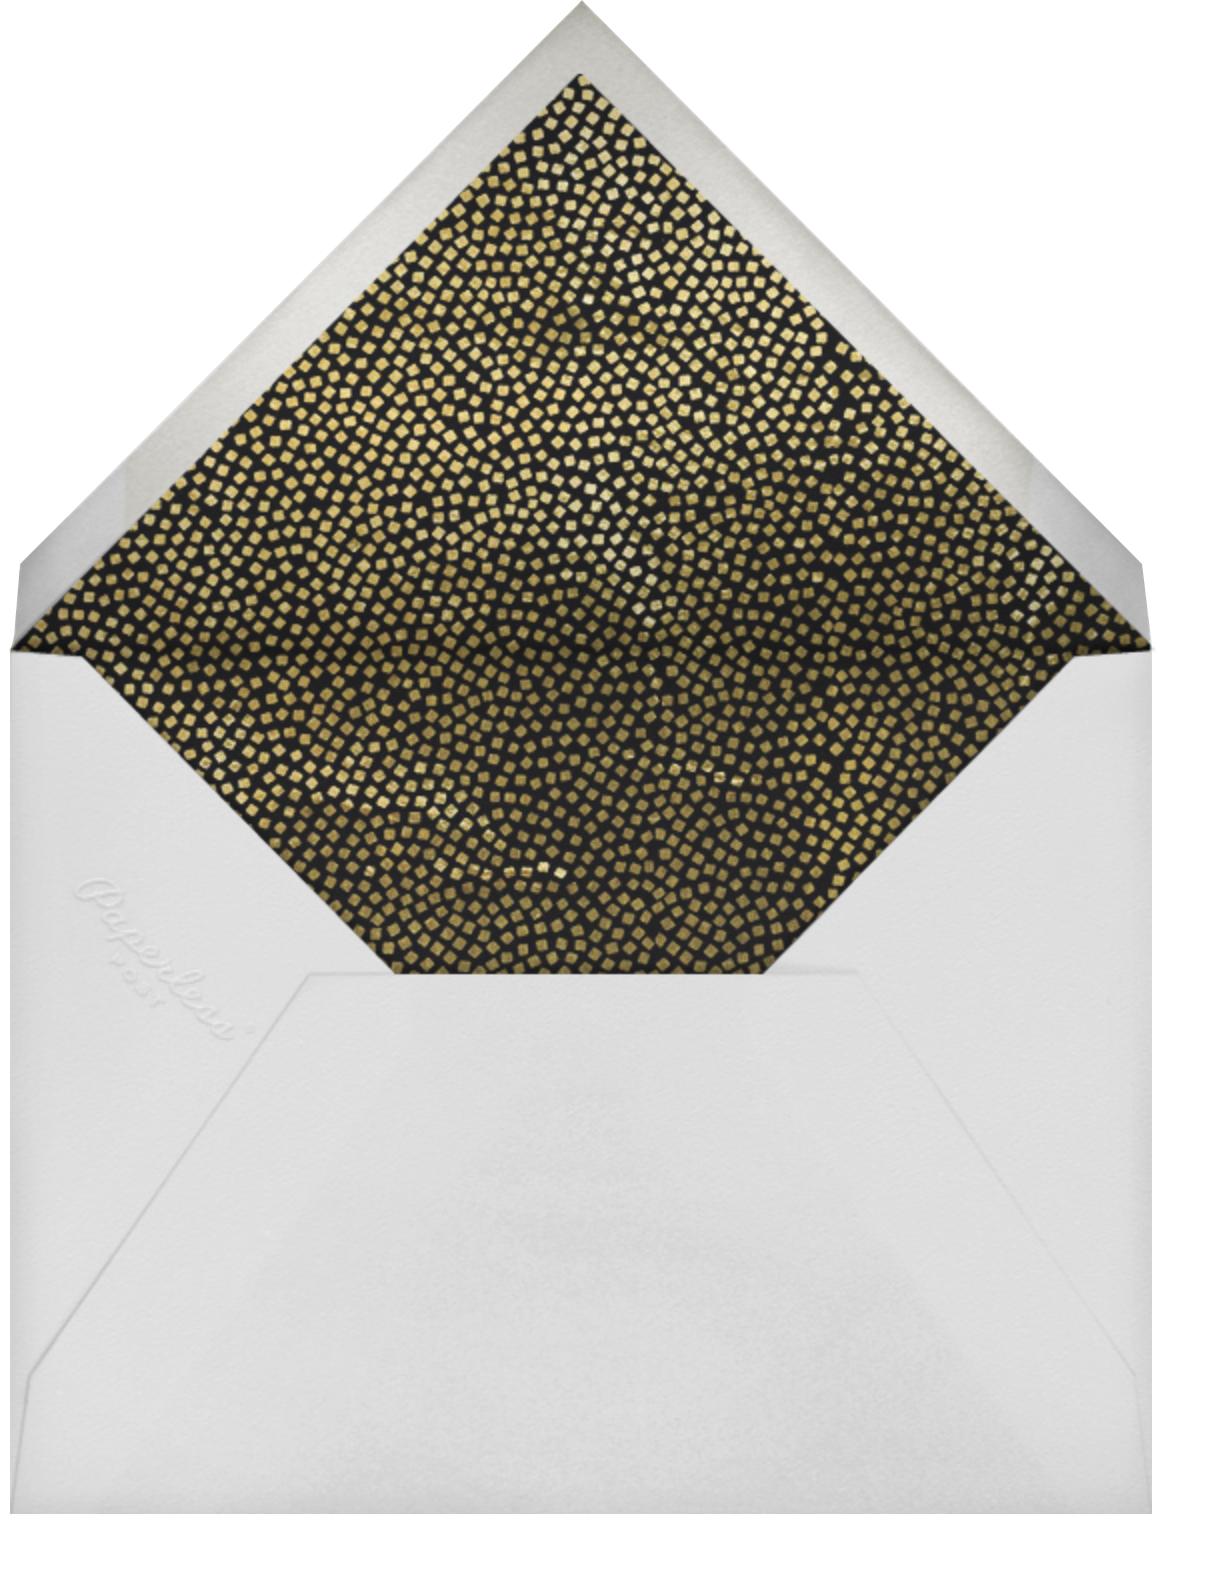 Konfetti (Photo) - Gold - Kelly Wearstler - Holiday cards - envelope back